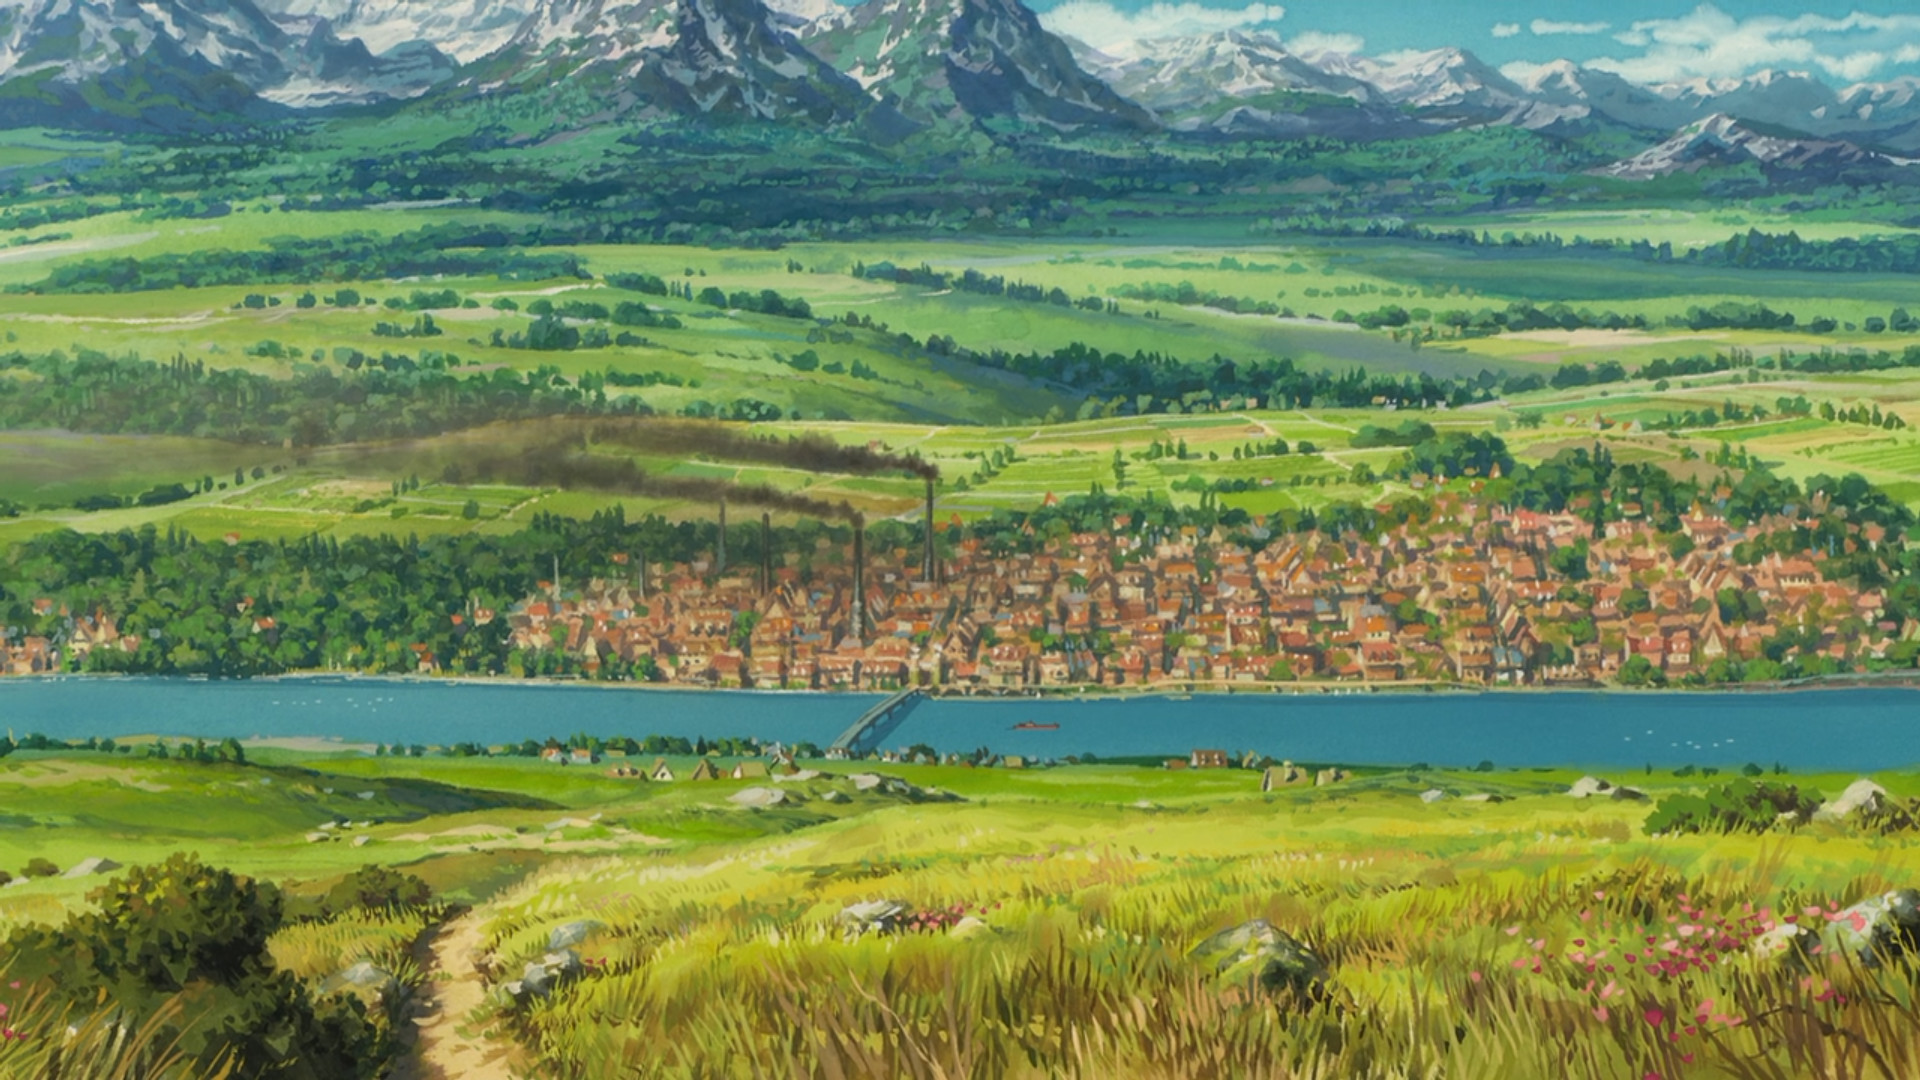 Howl's Moving Castle (2004) – Background Design | Art of Animation |  Pinterest | Studio ghibli, Studio and Animation